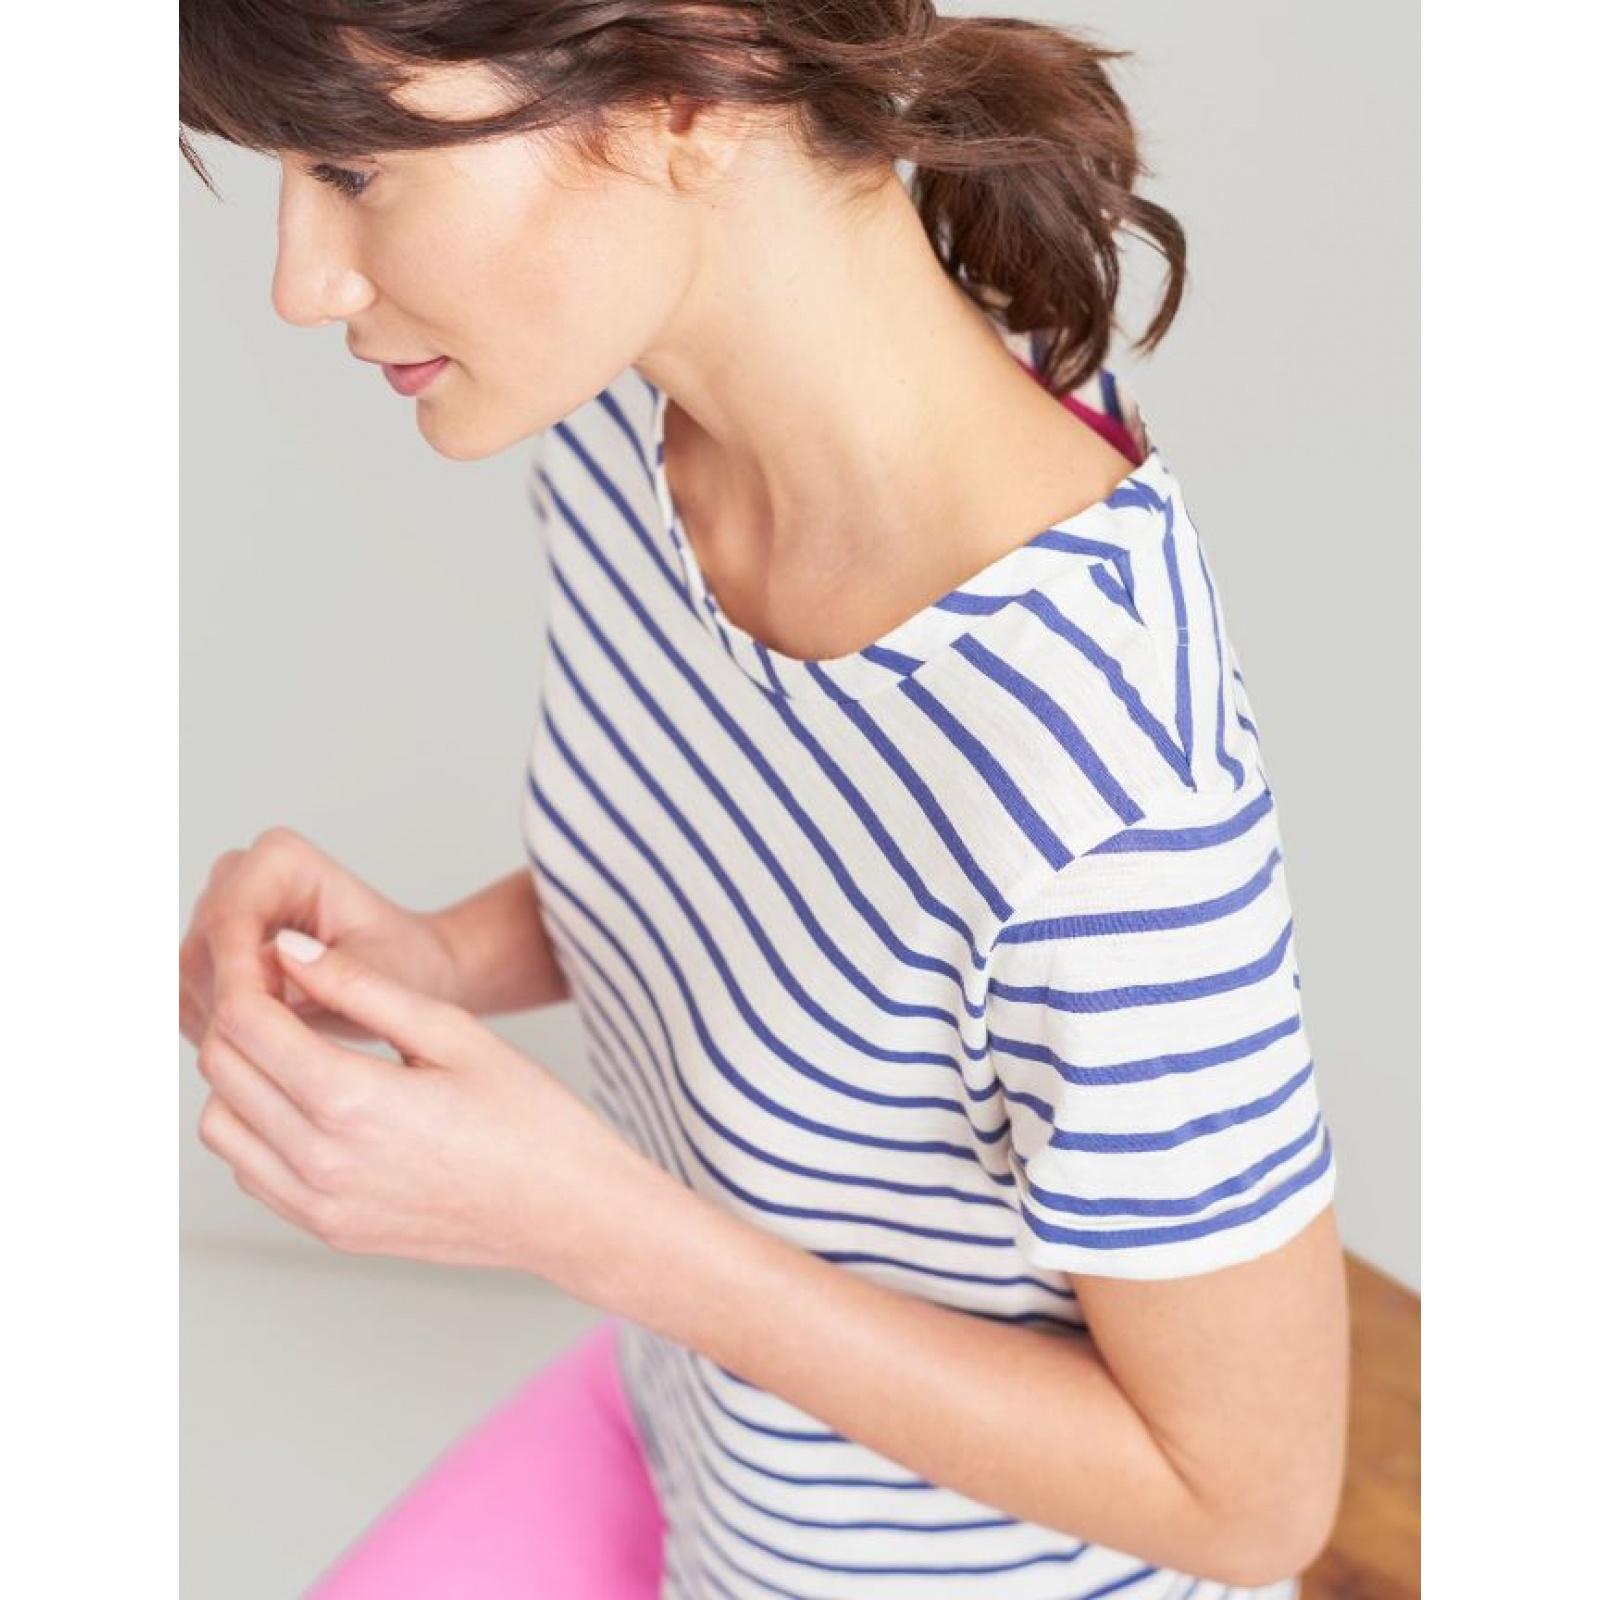 Joules-Nessa-Raya-Ligero-Jersey-Camiseta-SS19 miniatura 15